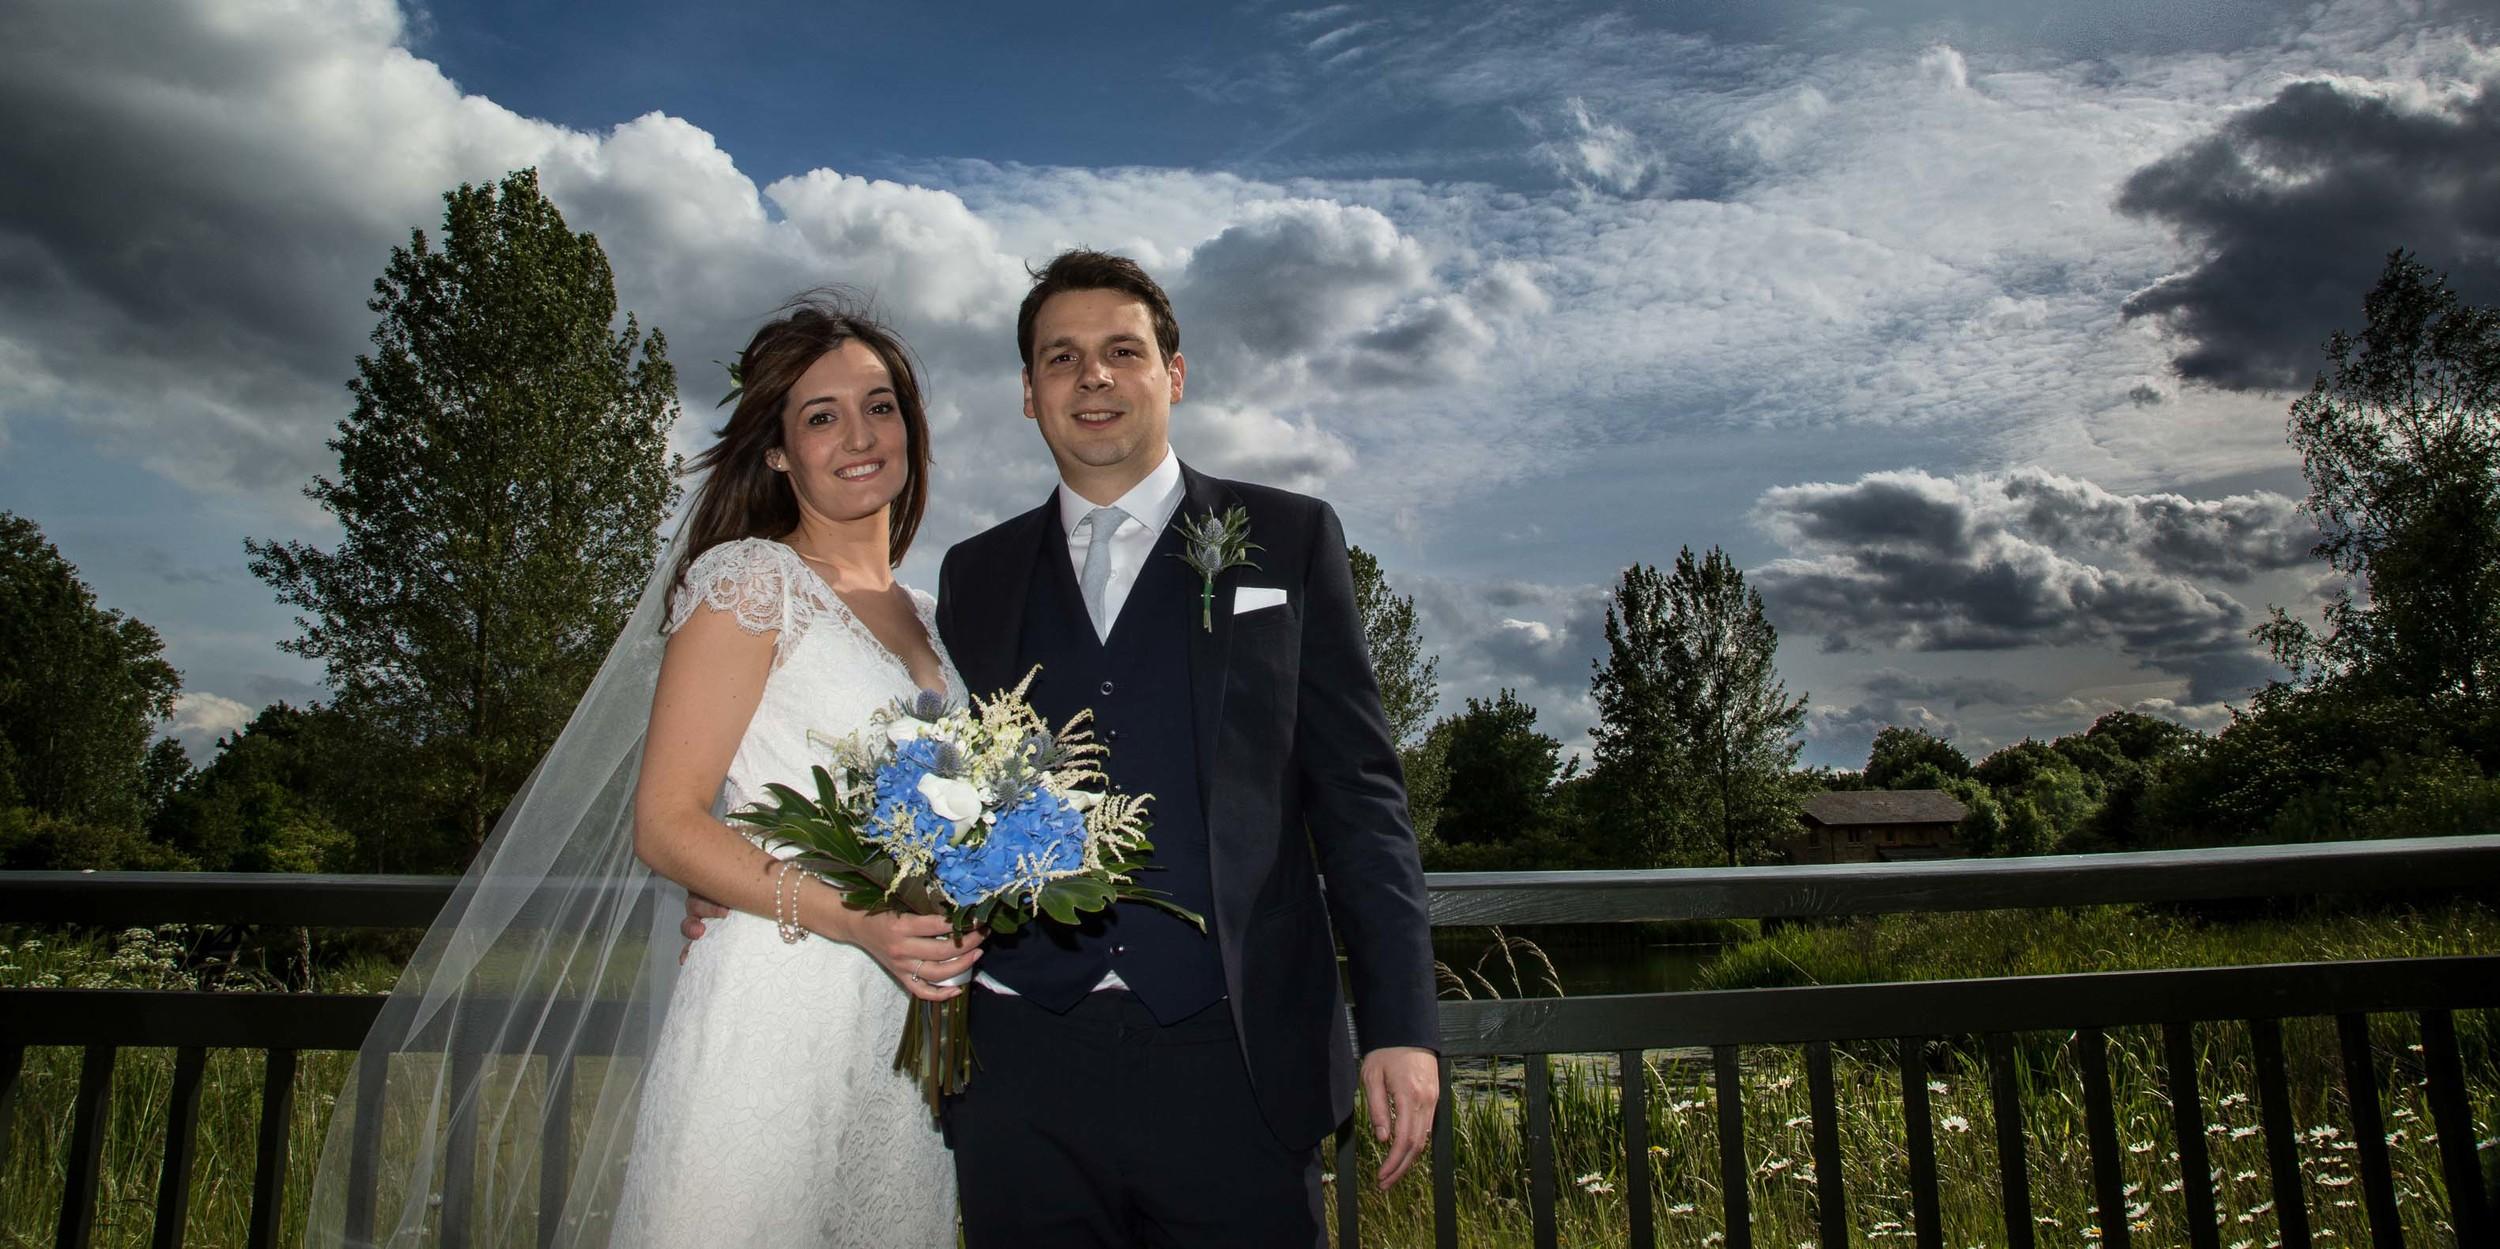 barnes-wedding-adam-rowley-photographer-01